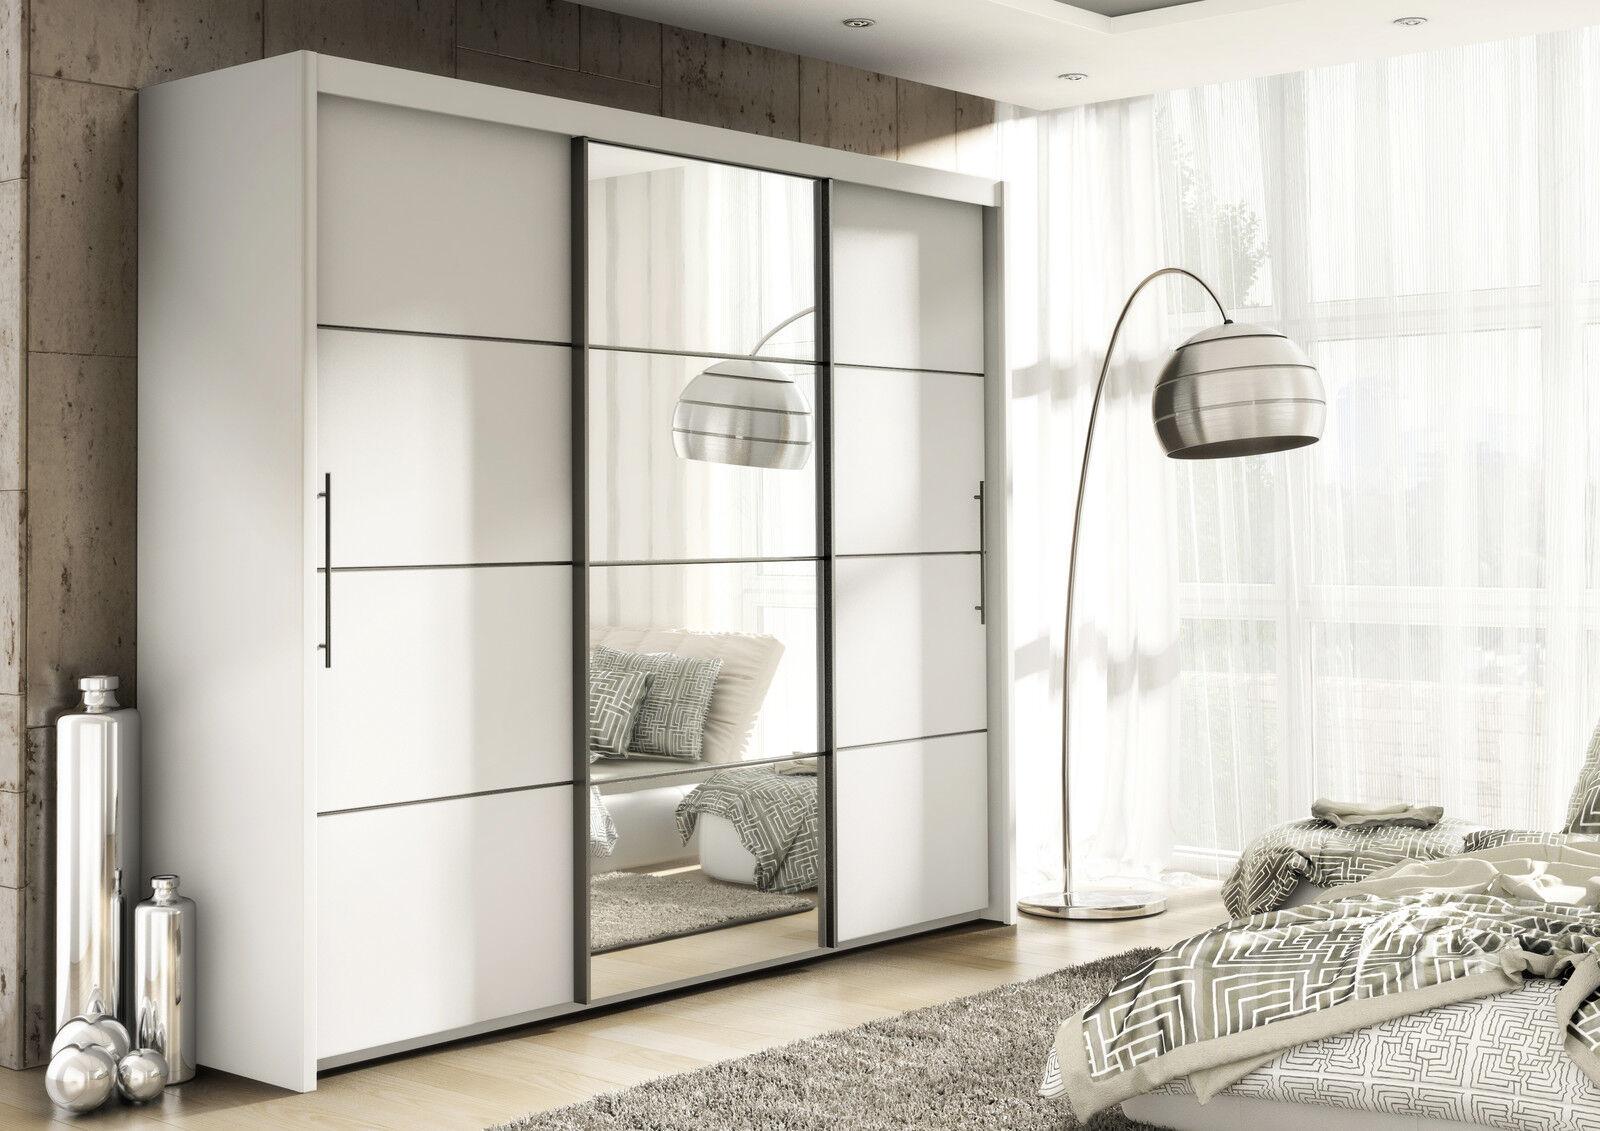 inova white sliding door wardrobe slider bedroom furniture chest of drawers ebay. Black Bedroom Furniture Sets. Home Design Ideas